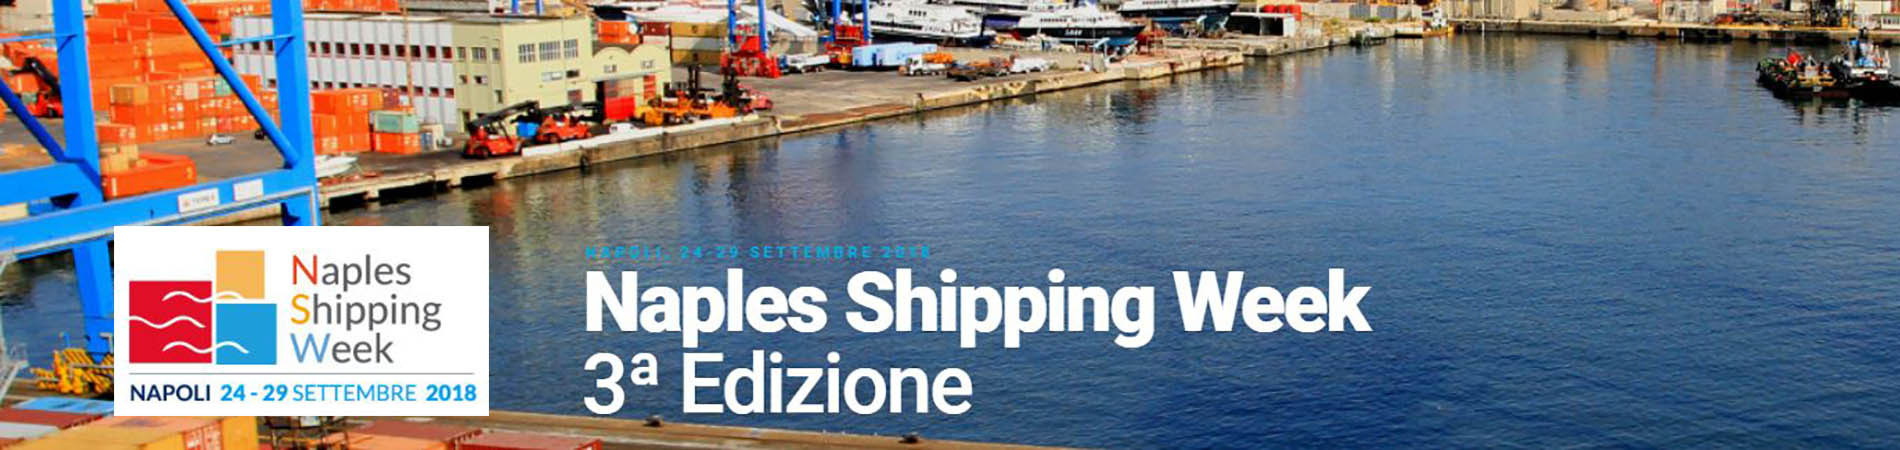 RETE-Naples-Shipping-Week-2018